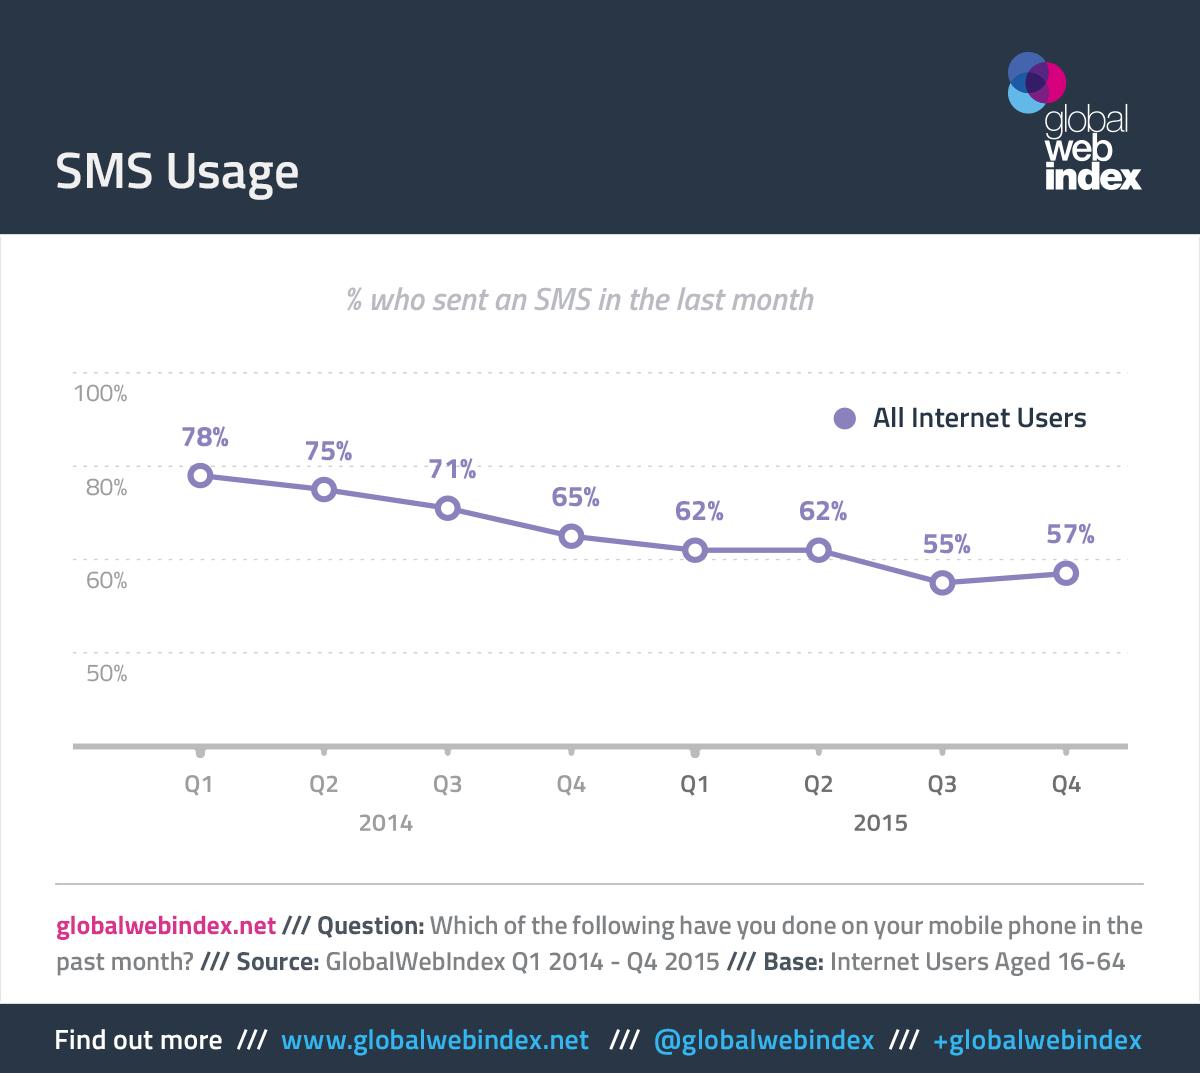 SMS Usage